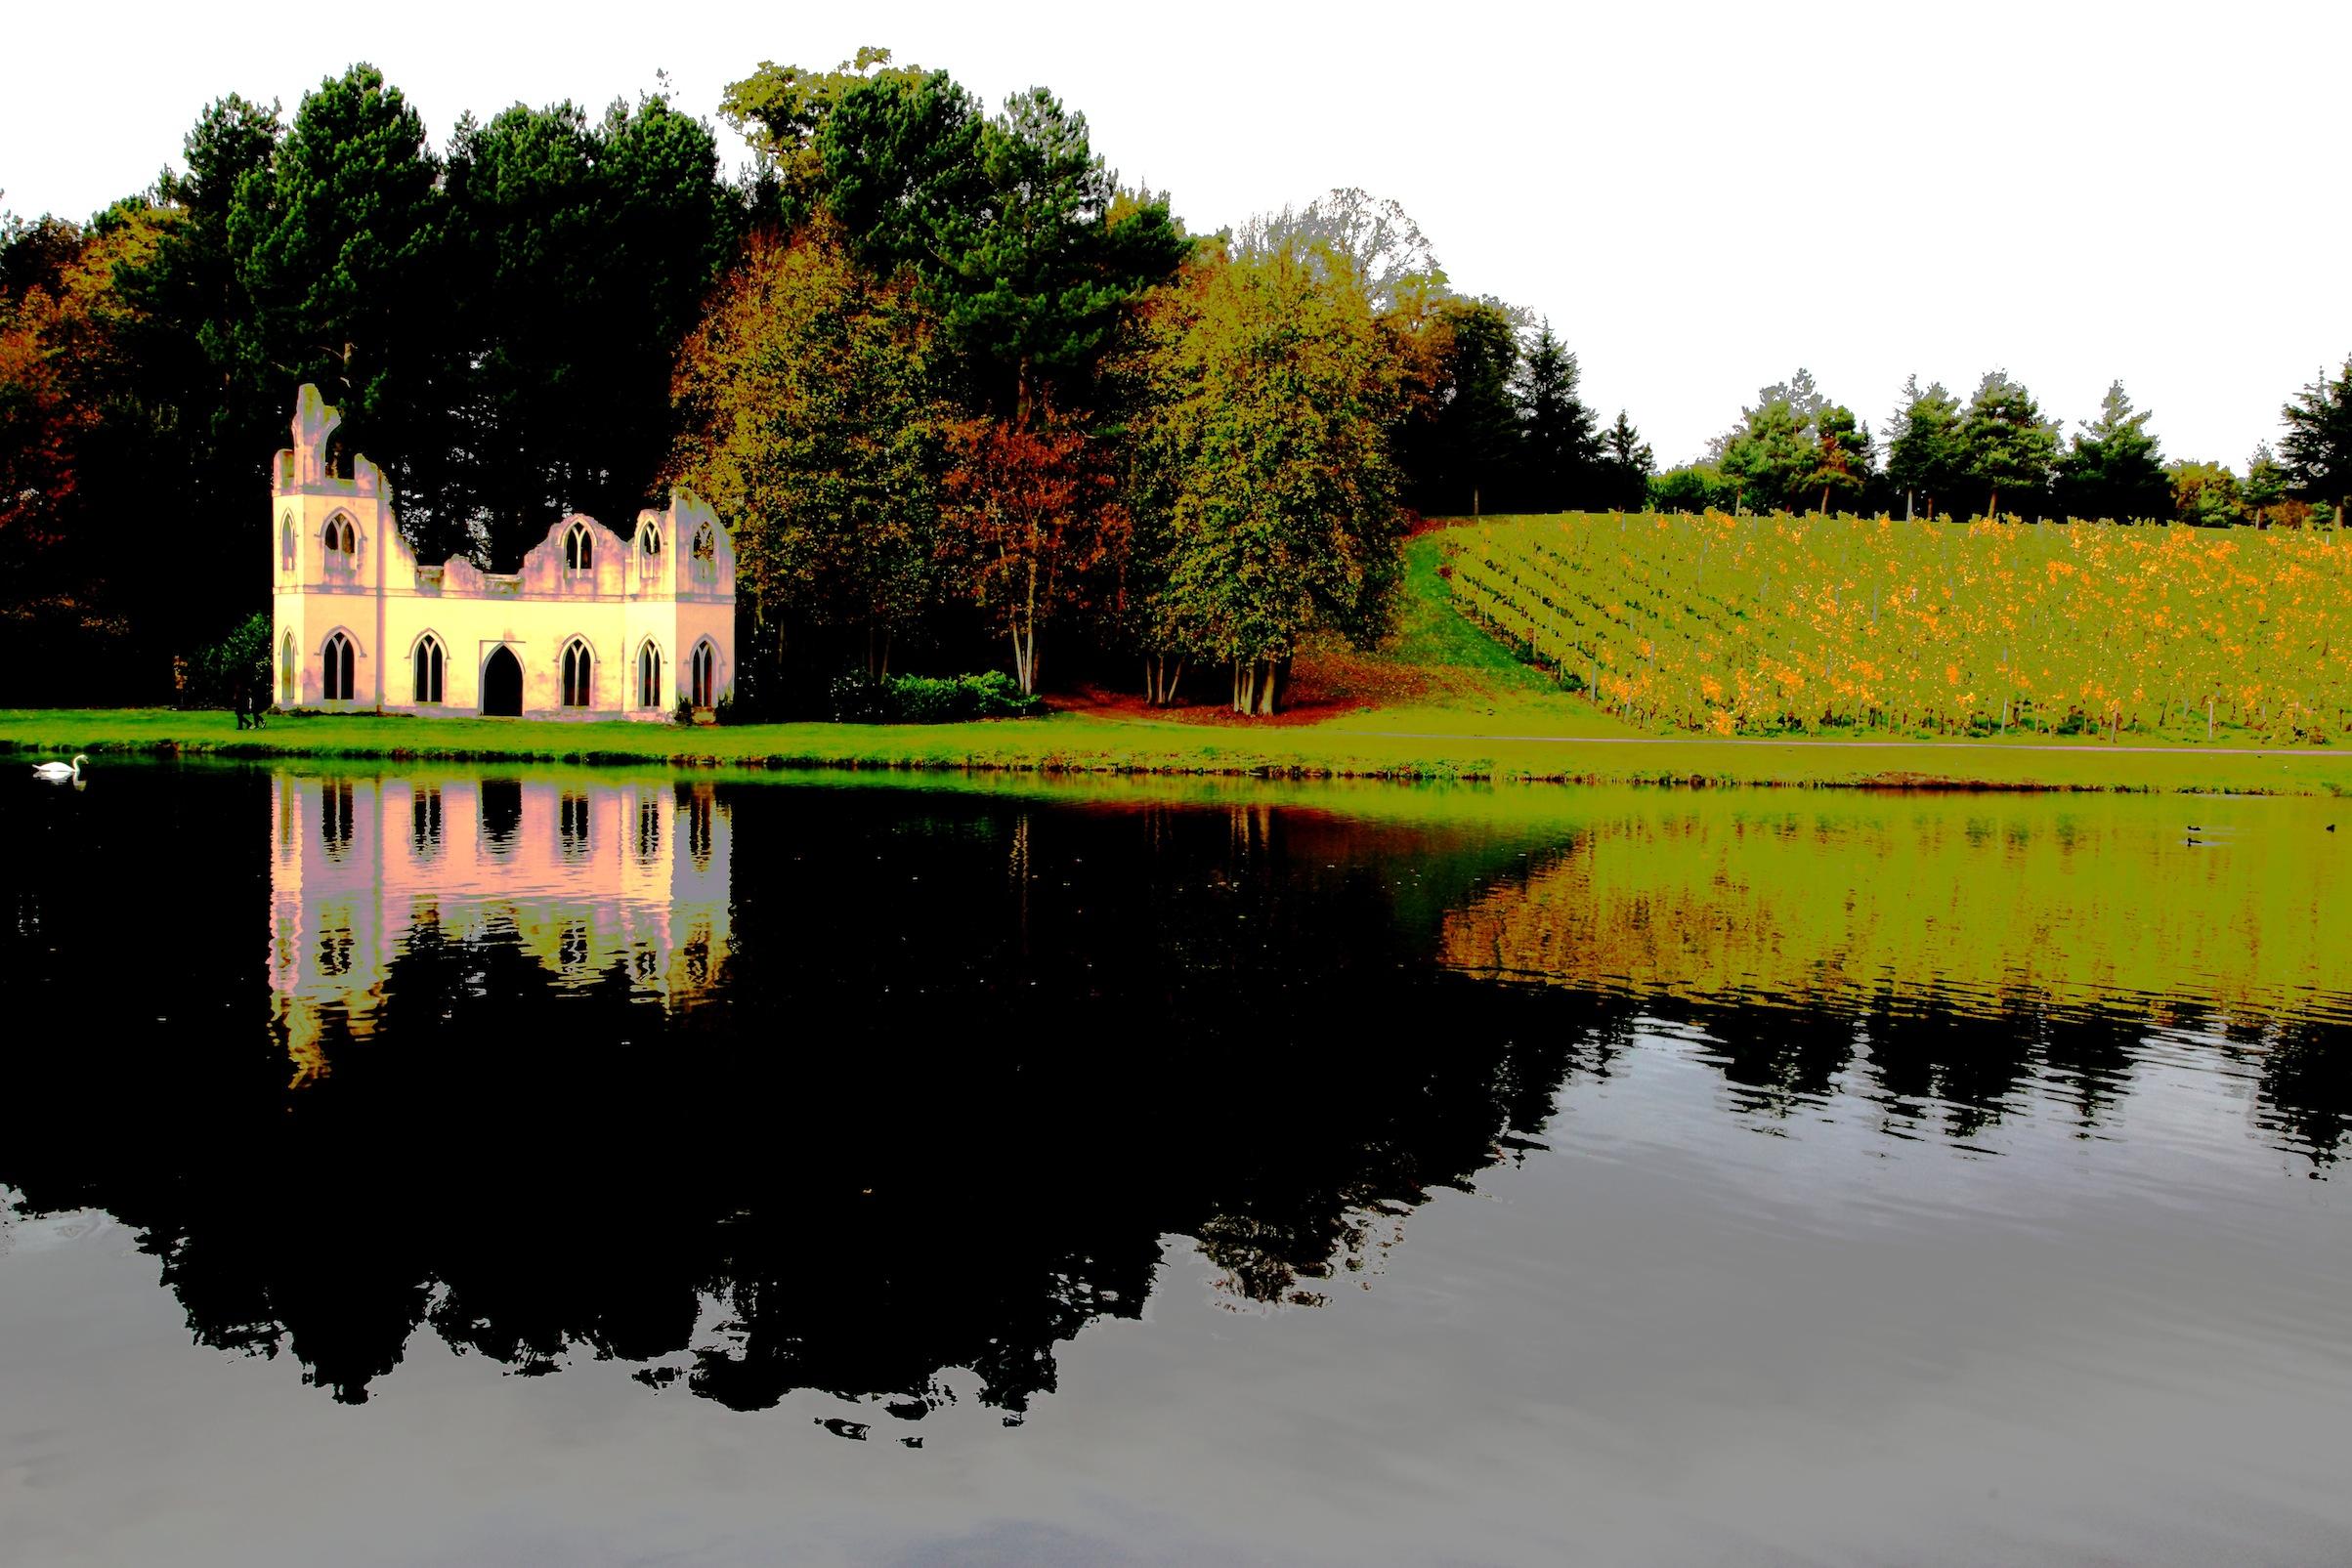 Painshill Park In Cobham Surrey